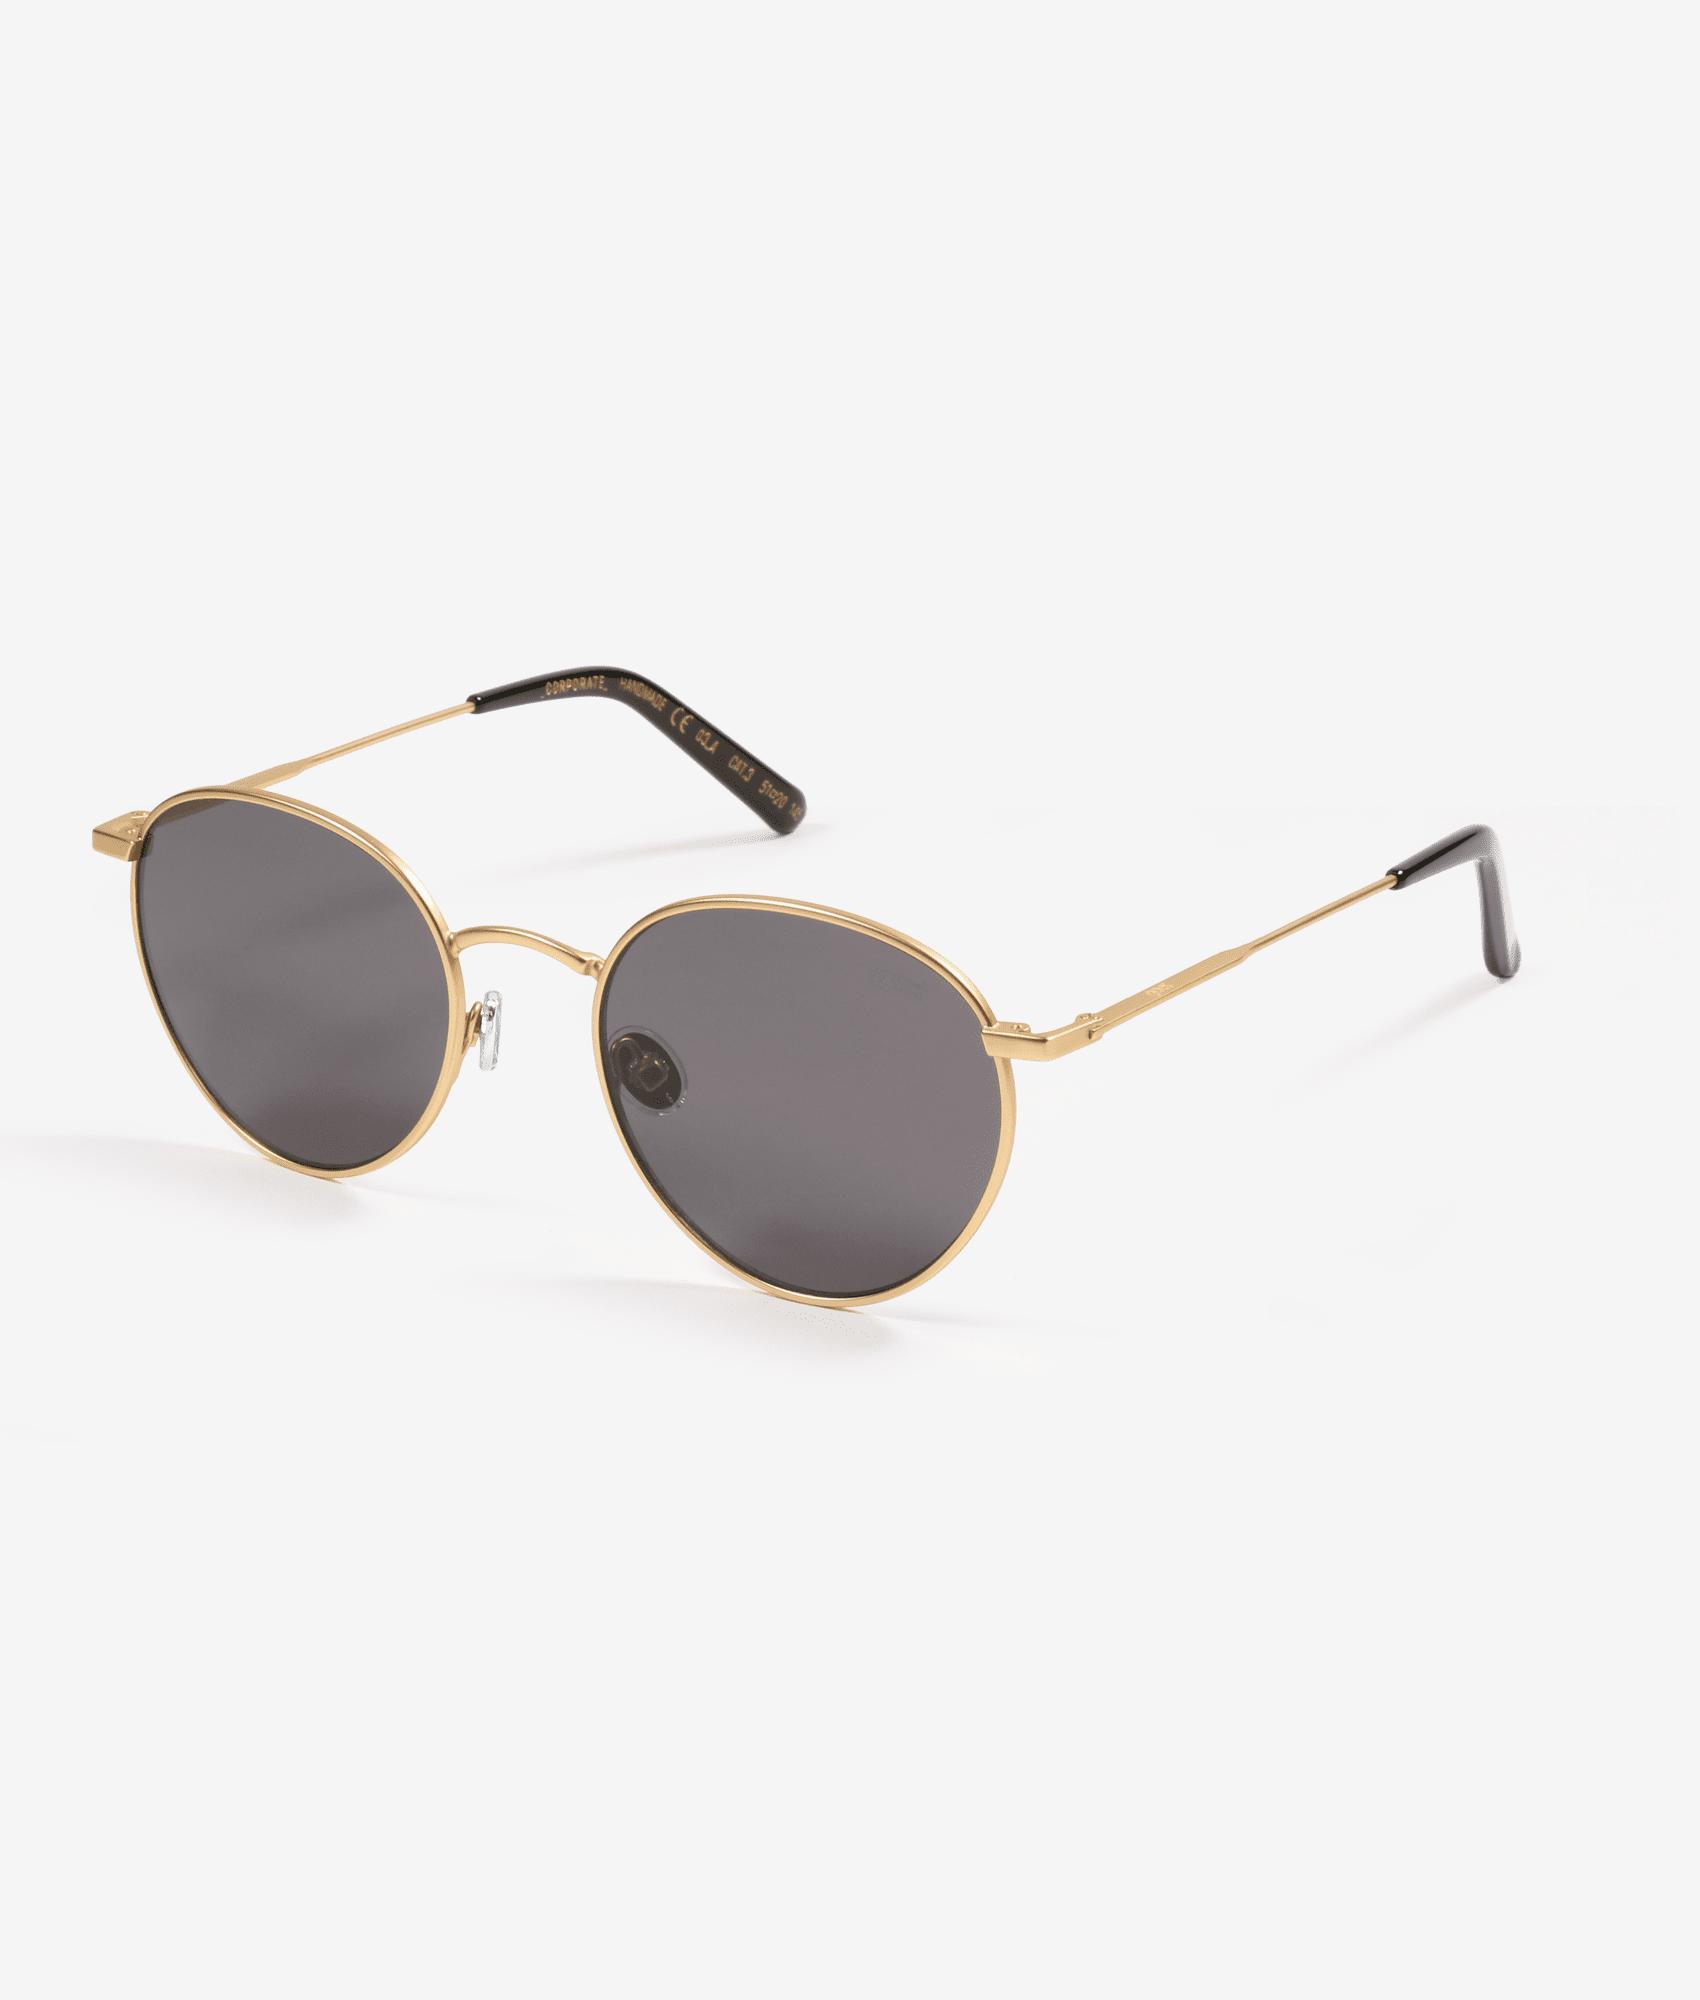 CORPORATE Gast Sunglasses